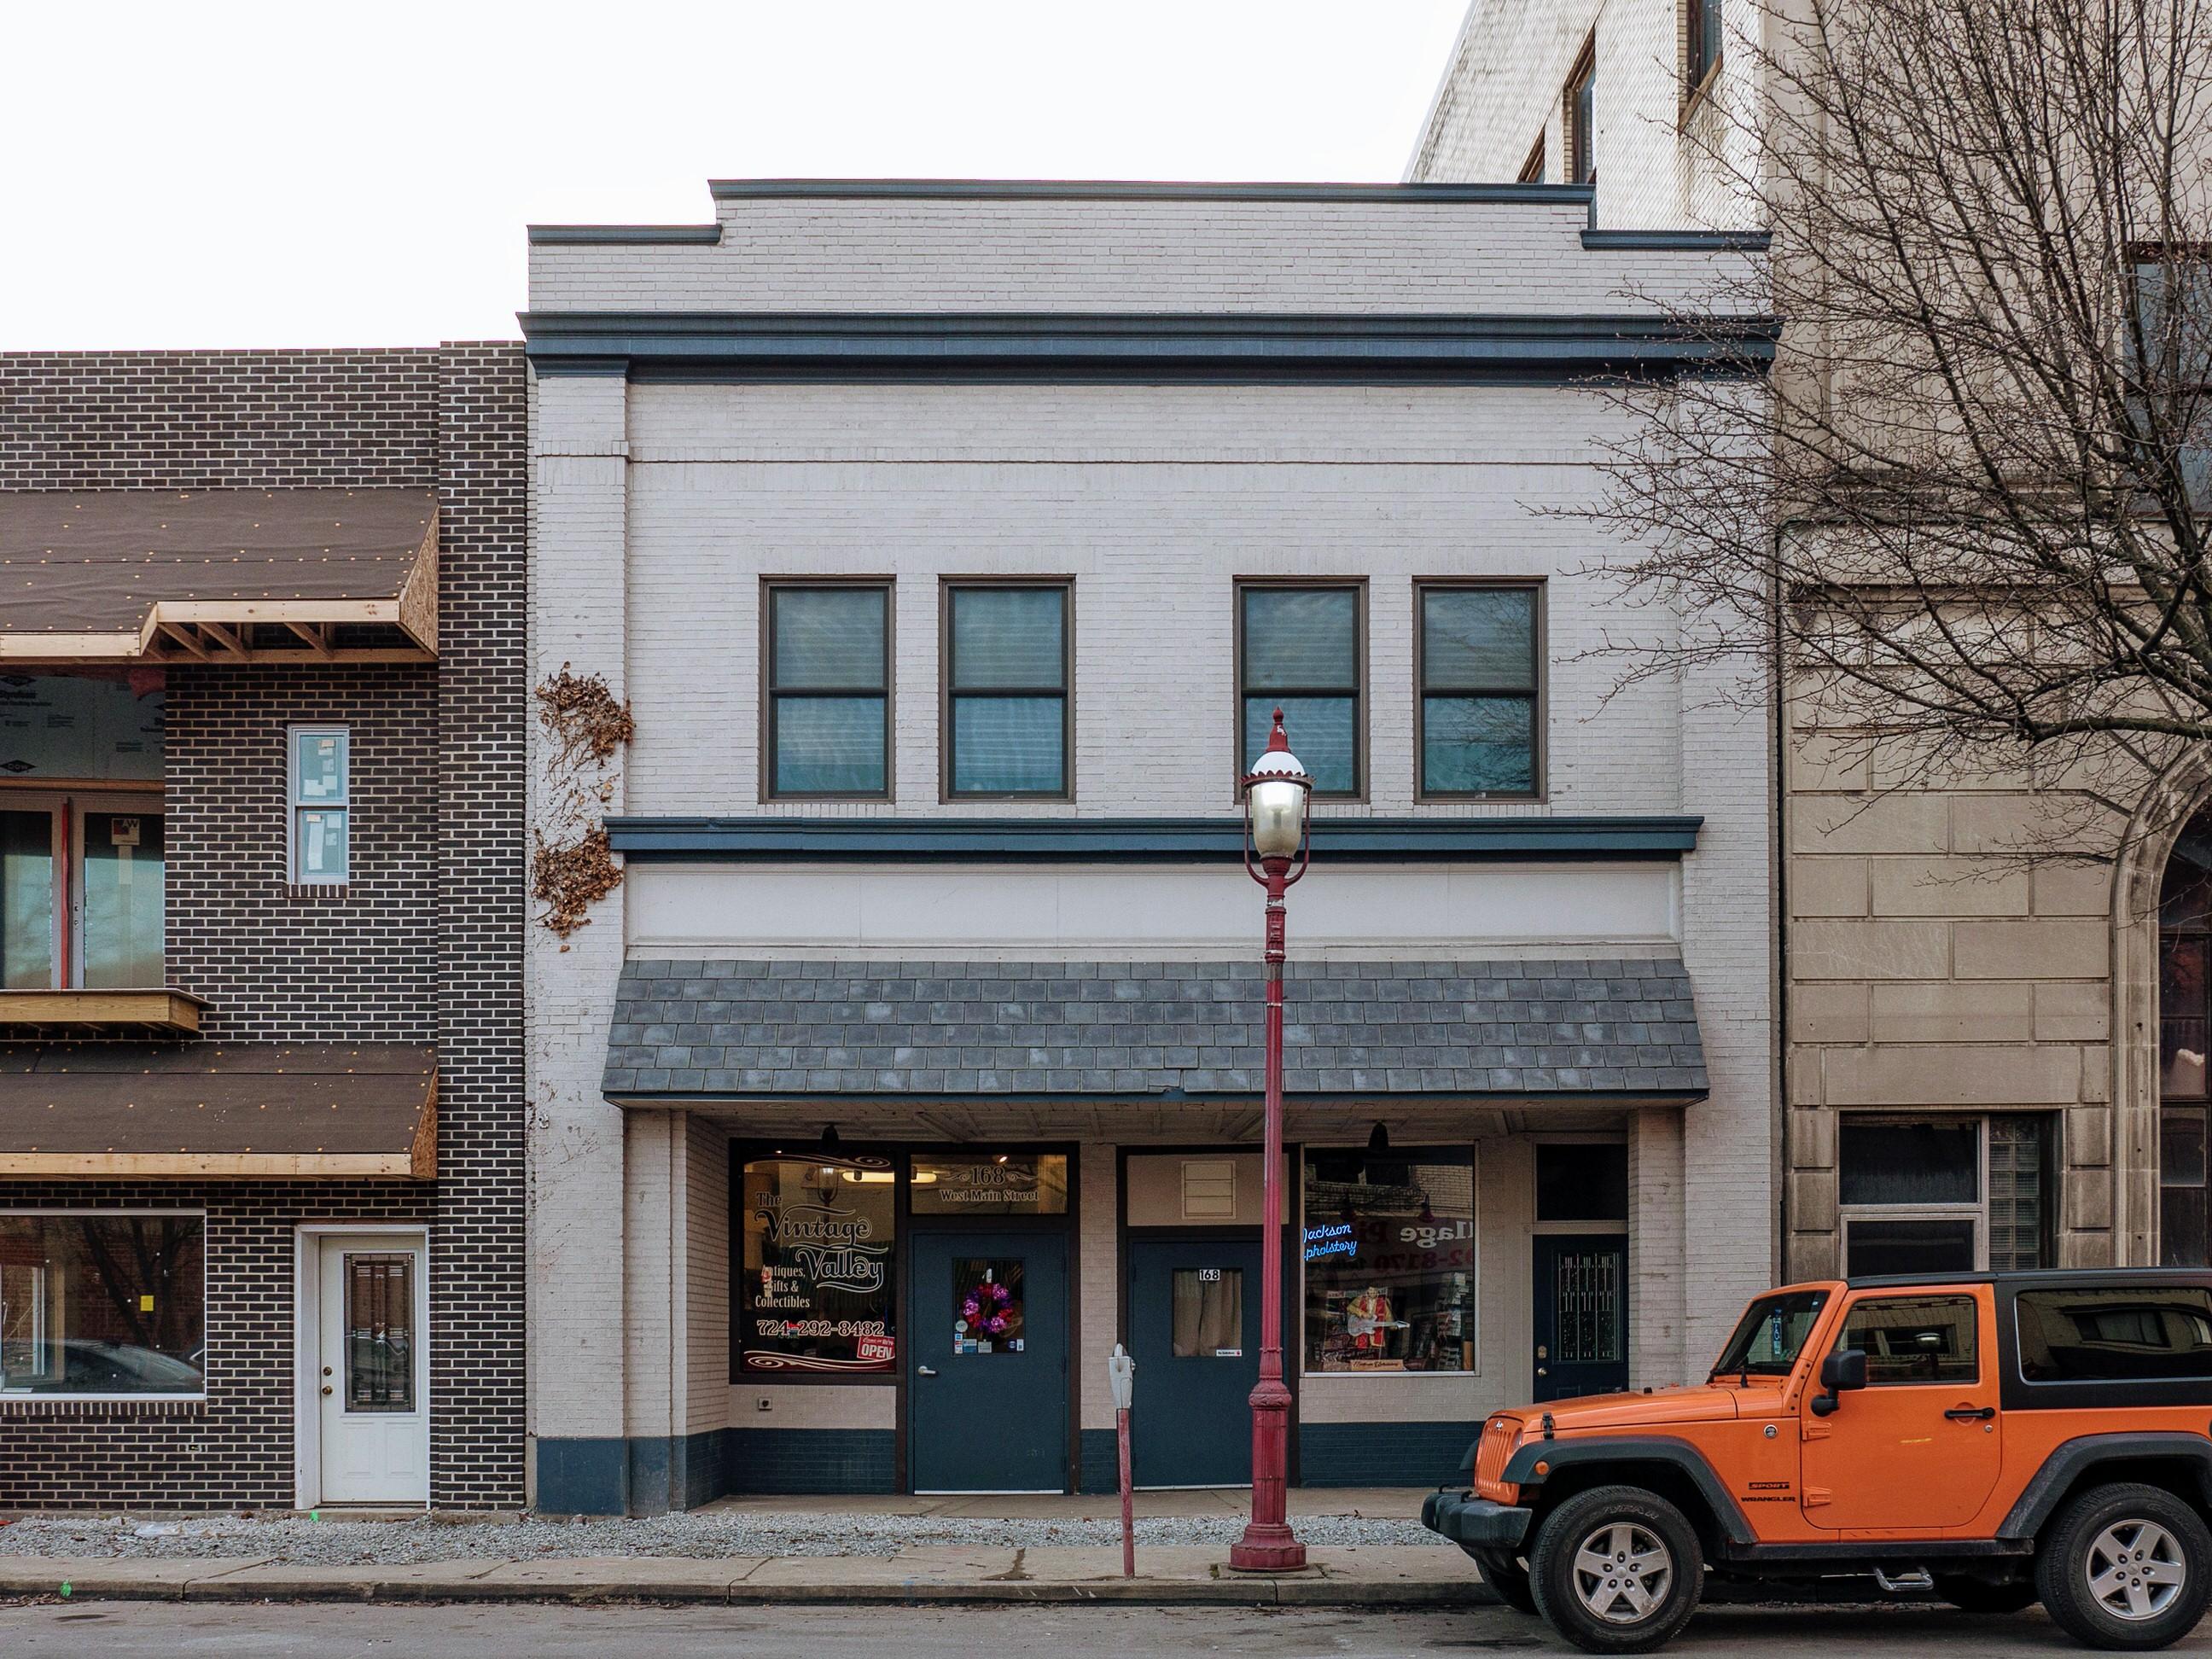 Photo of building at 168 West Main Street, Monongahela, Pa. 15063 along rt 88 and rt 136. Photo property of the Monongahela Main Street Program.